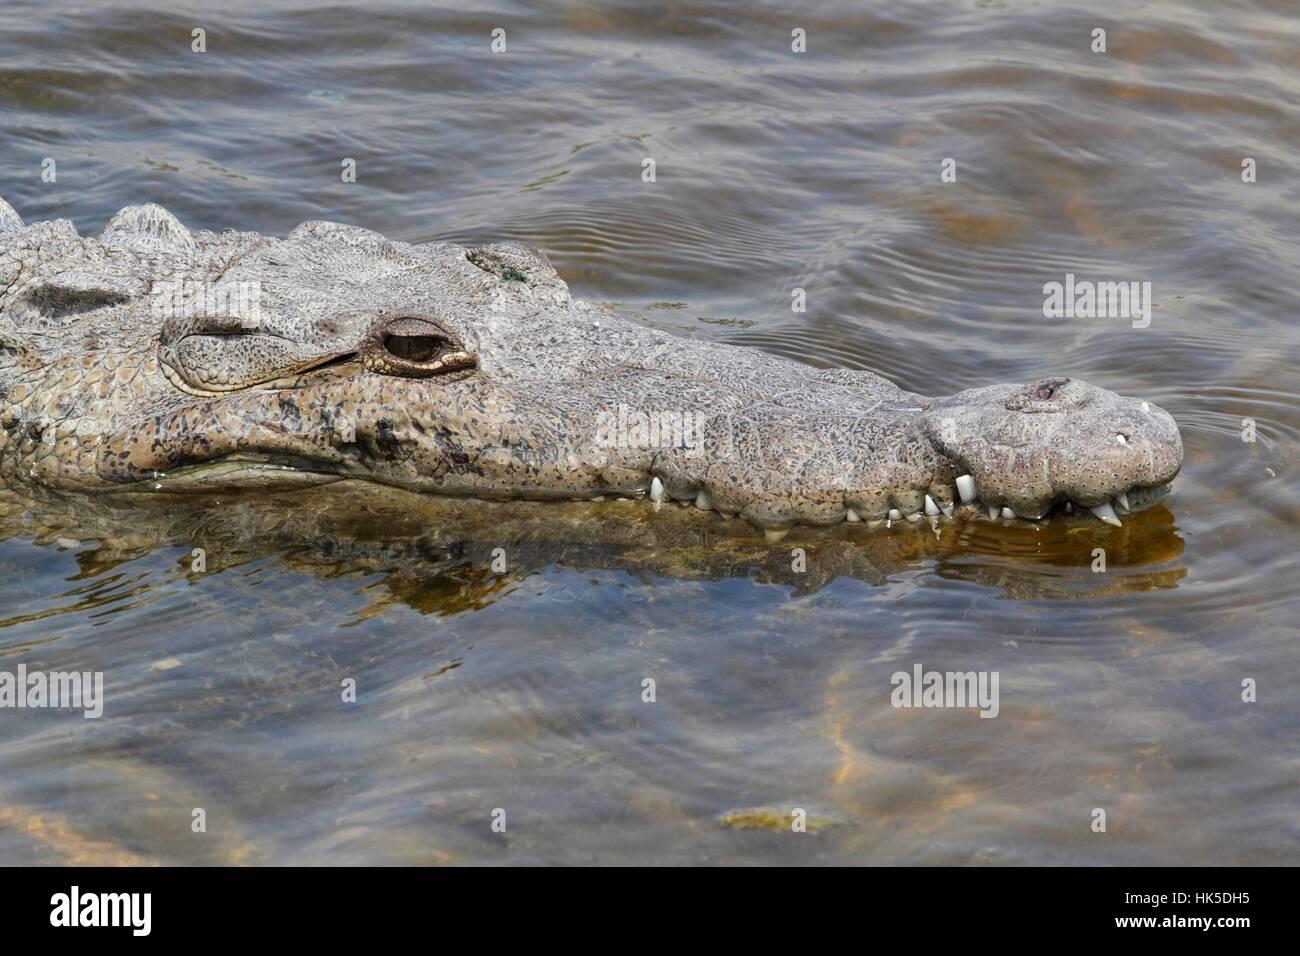 reptile, crocodile, swimming, water, swiming, swim, swims, to do the crawl, - Stock Image